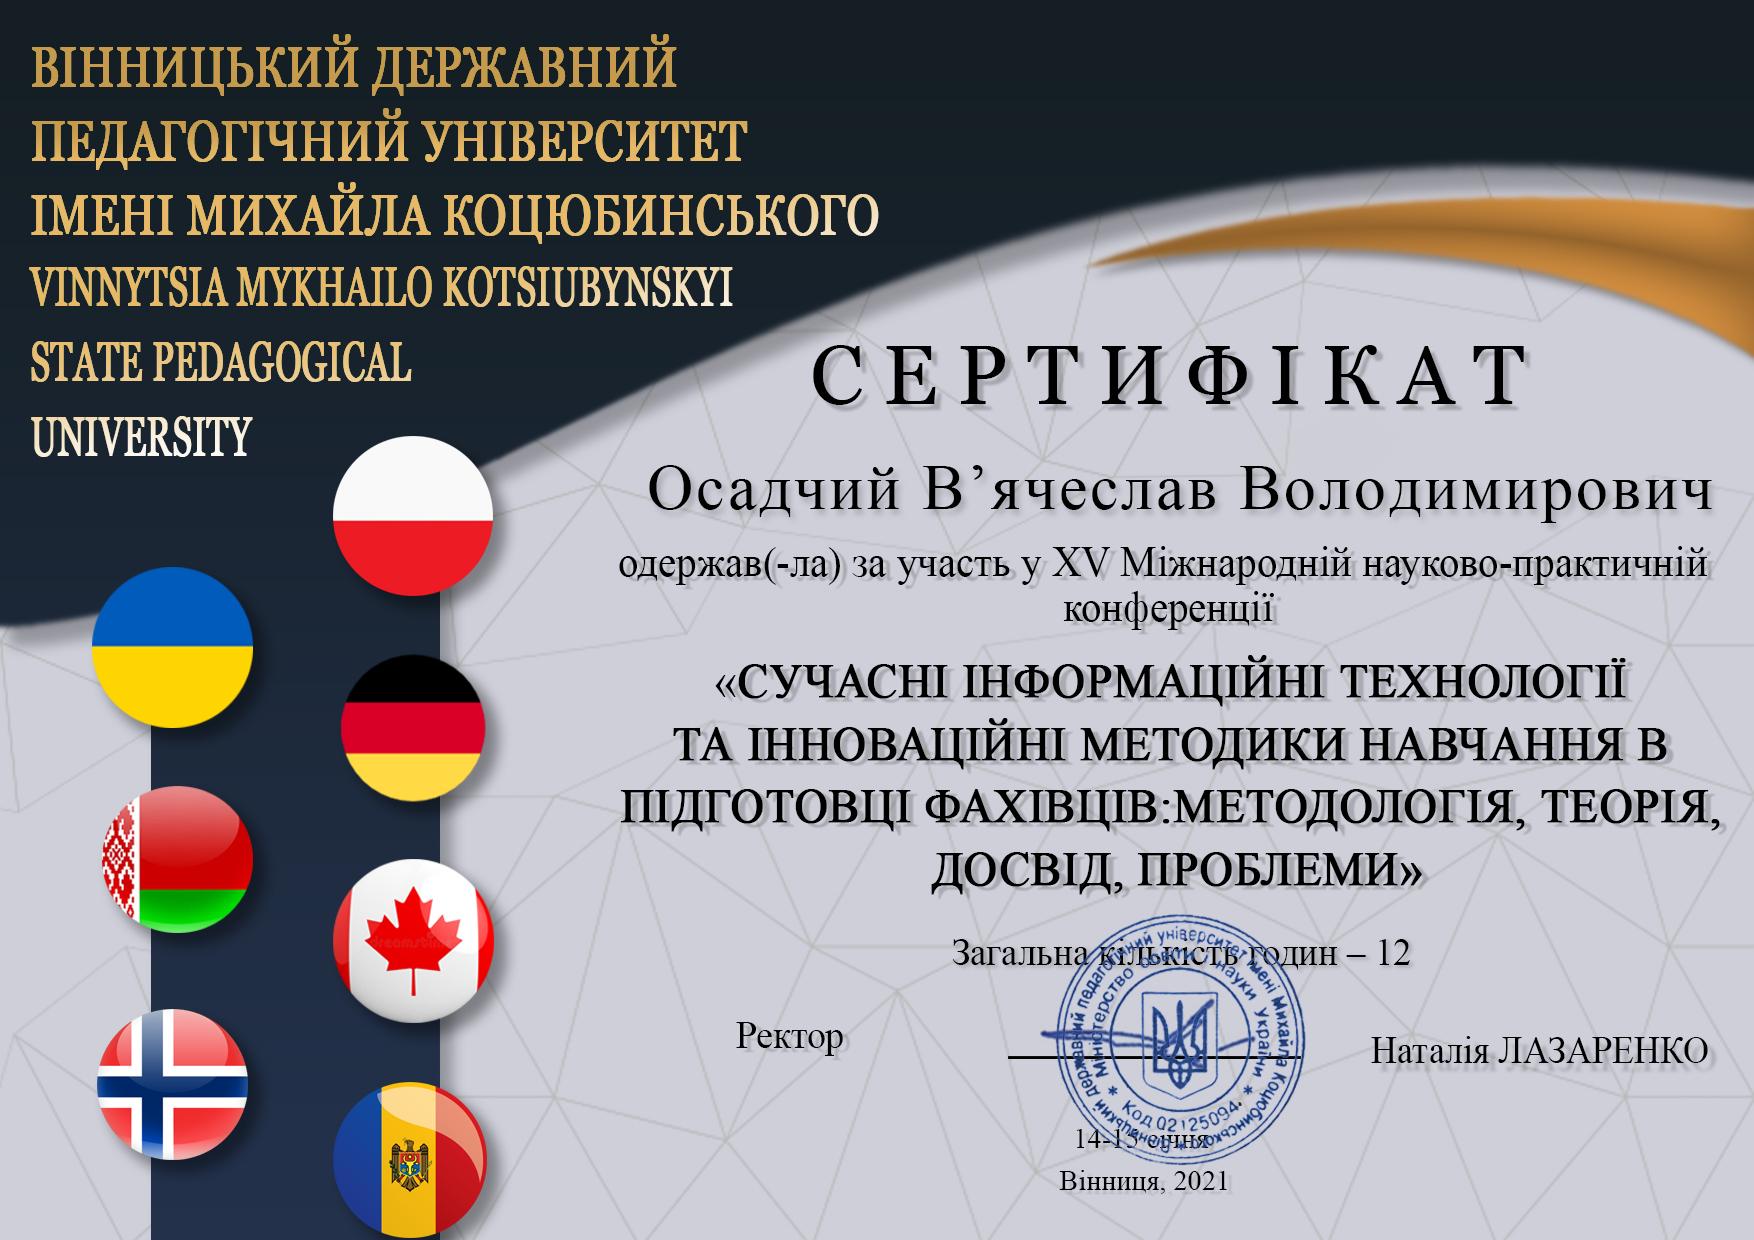 Осадчий В'ячеслав Володимирович